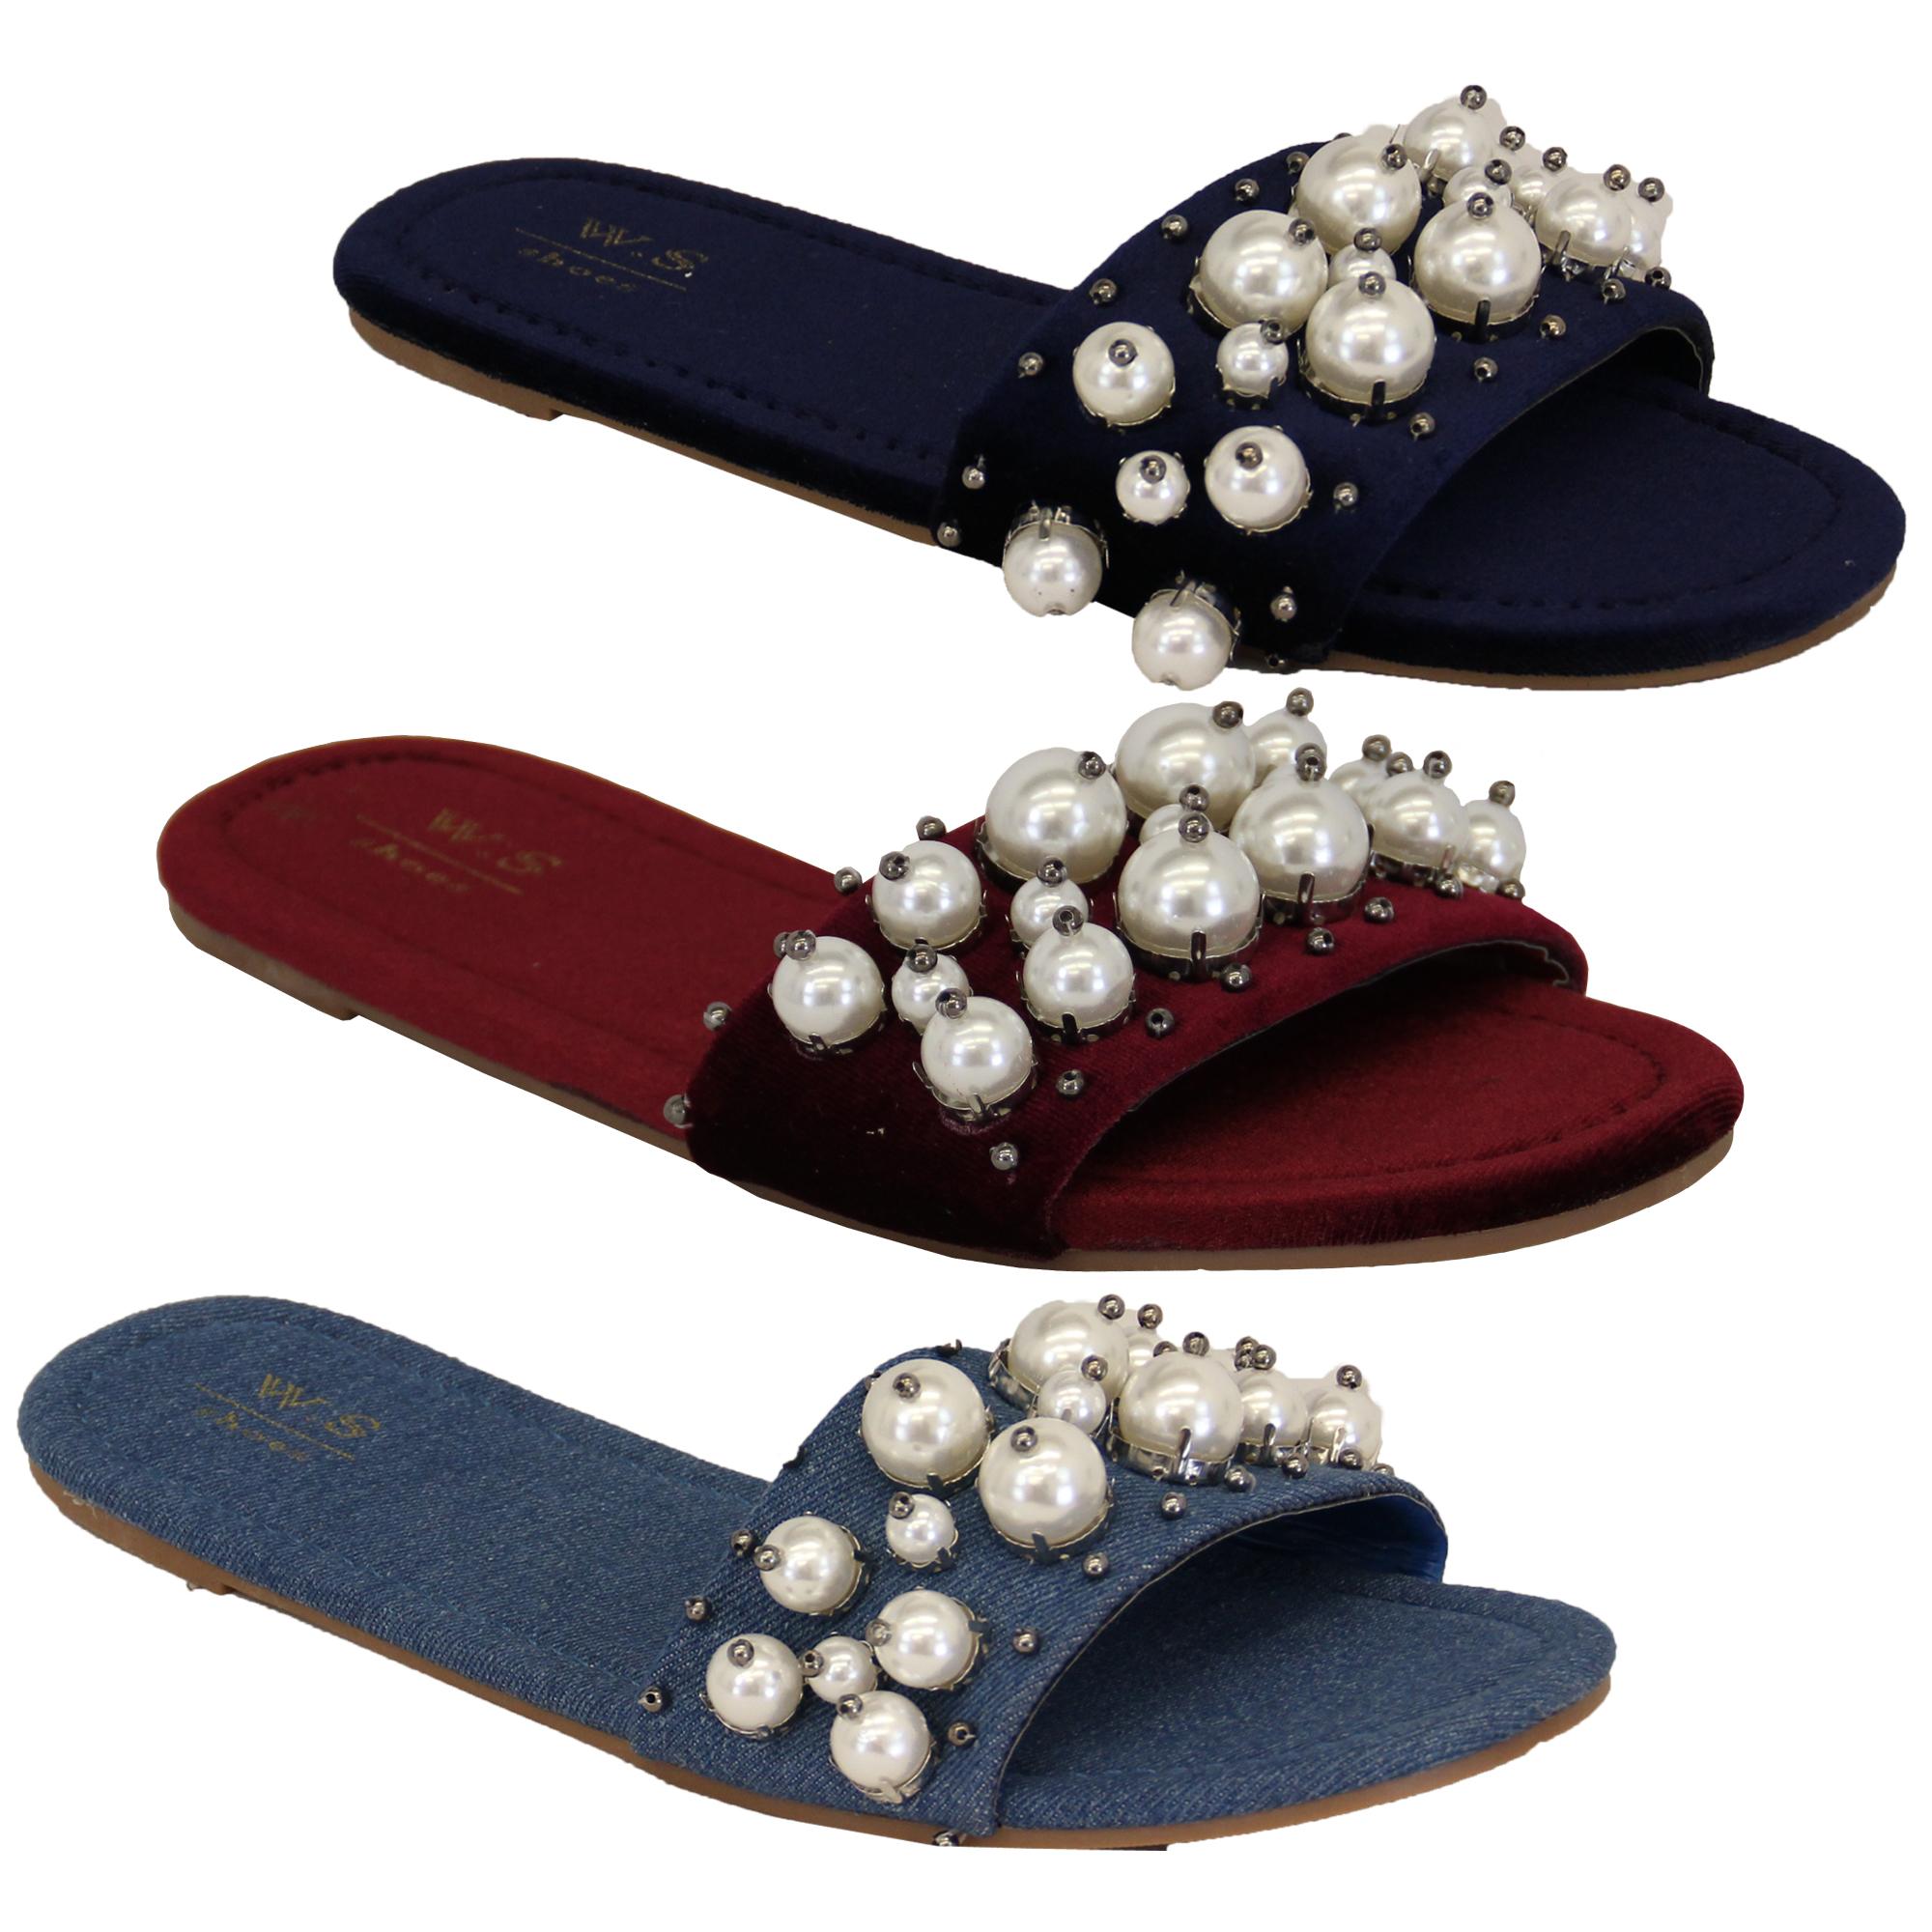 07239efdd7 Details about Ladies Slip On Sliders Womens Sandals Suede Slipper Pearl  Bead Flat Denim Comfy